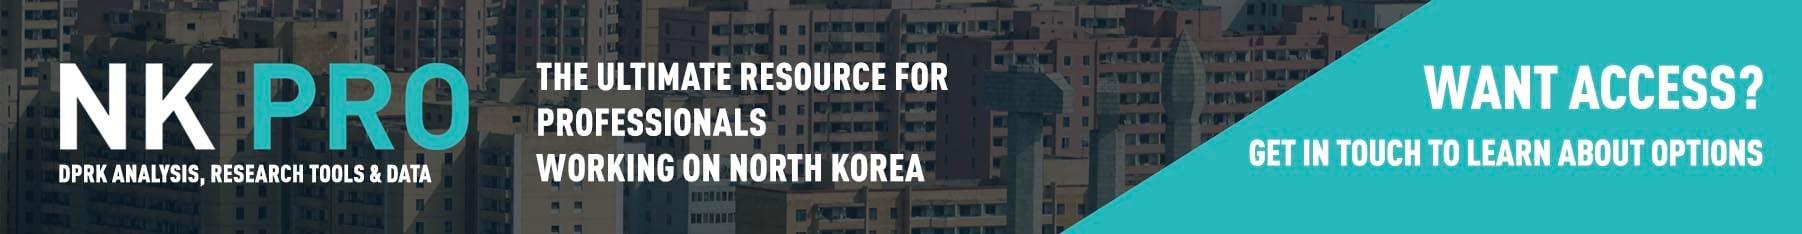 NK Pro Banner